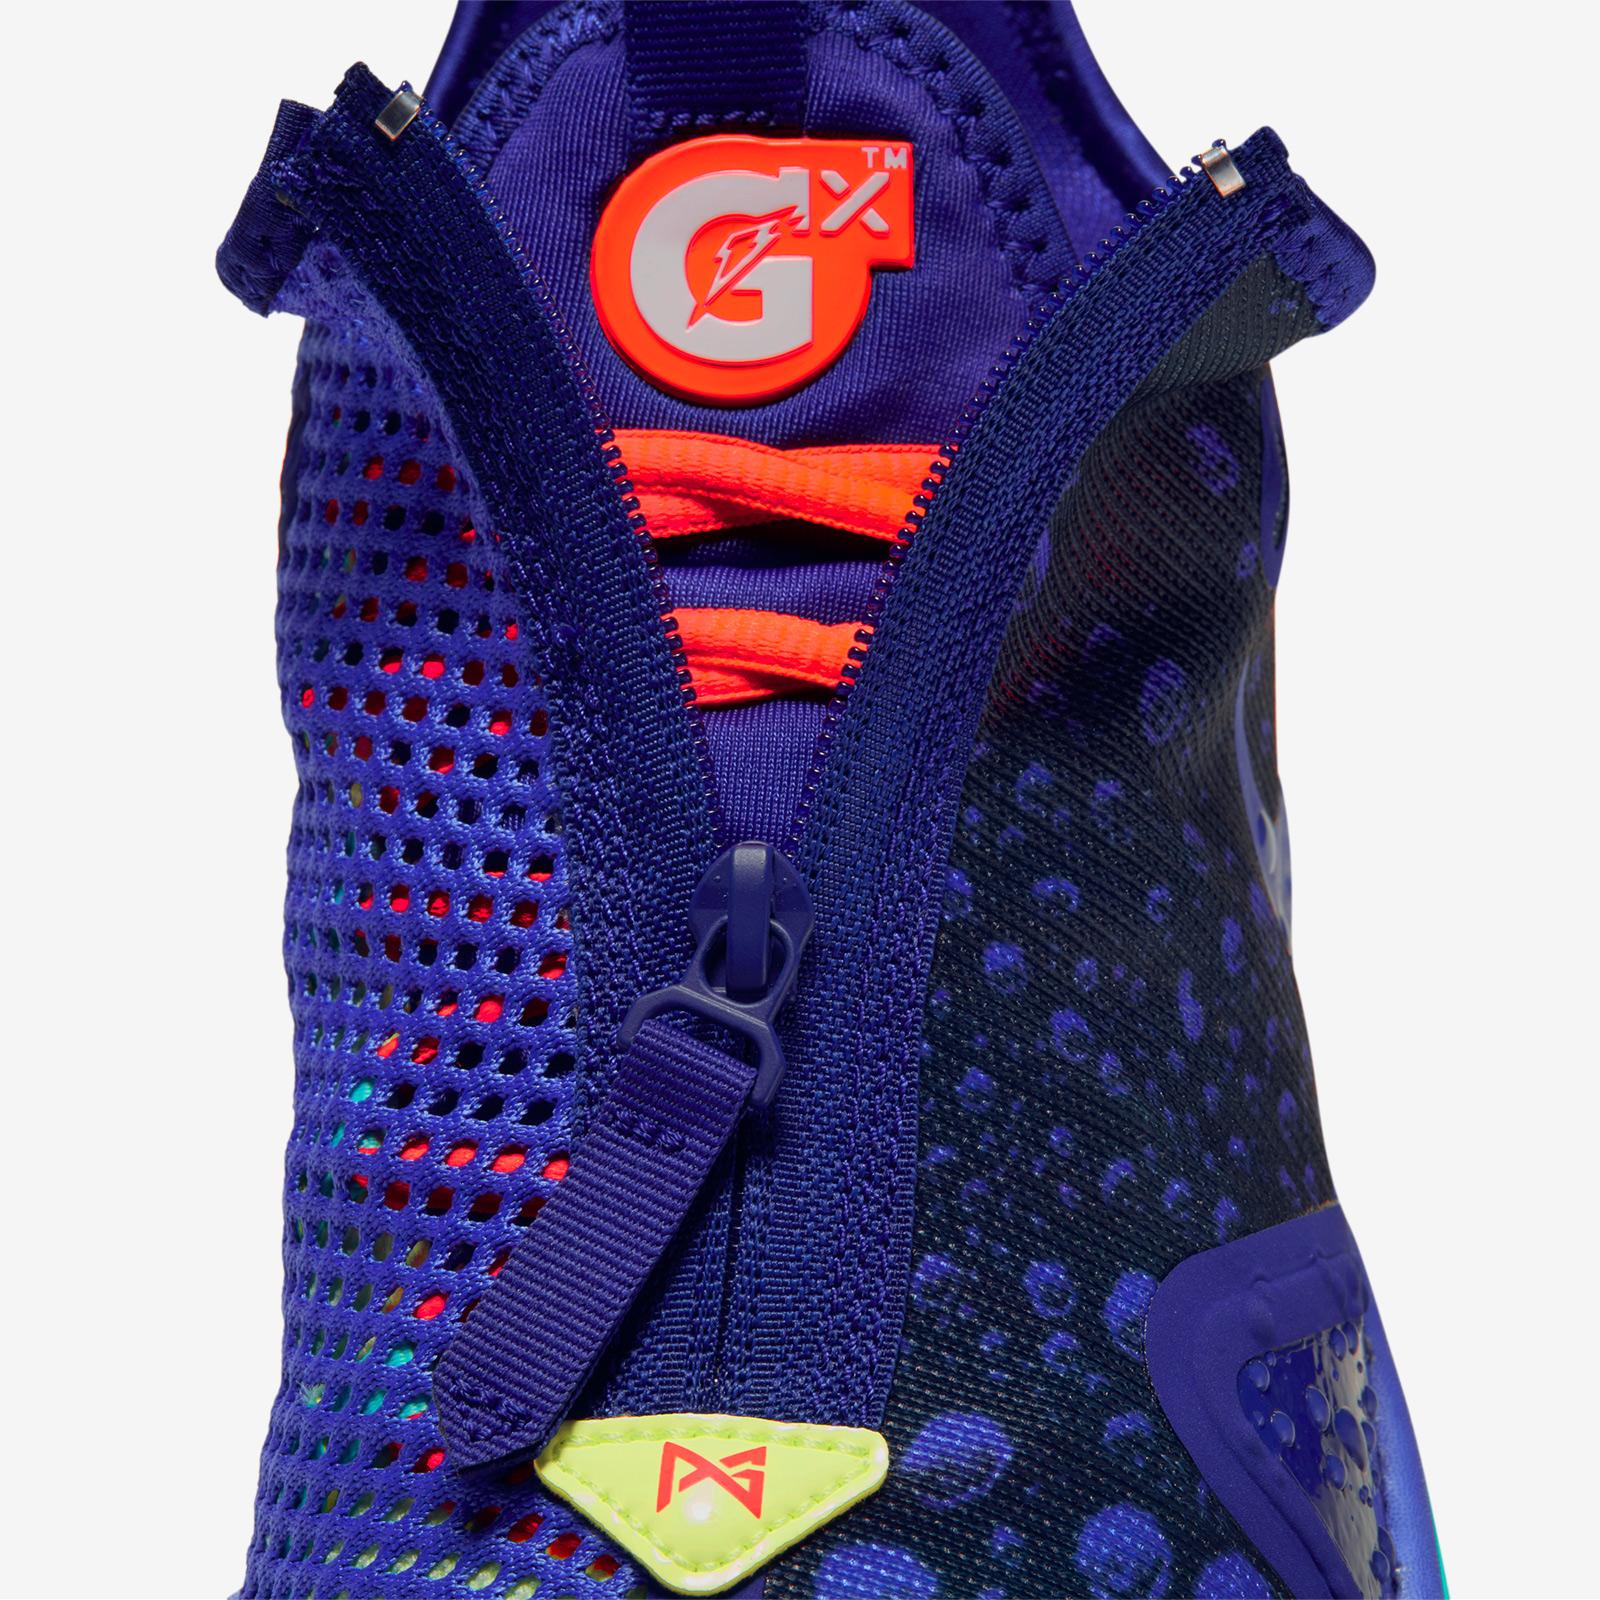 Nike PG 4 Gatorade GX Cd5078 500 Sneakersnstuff I